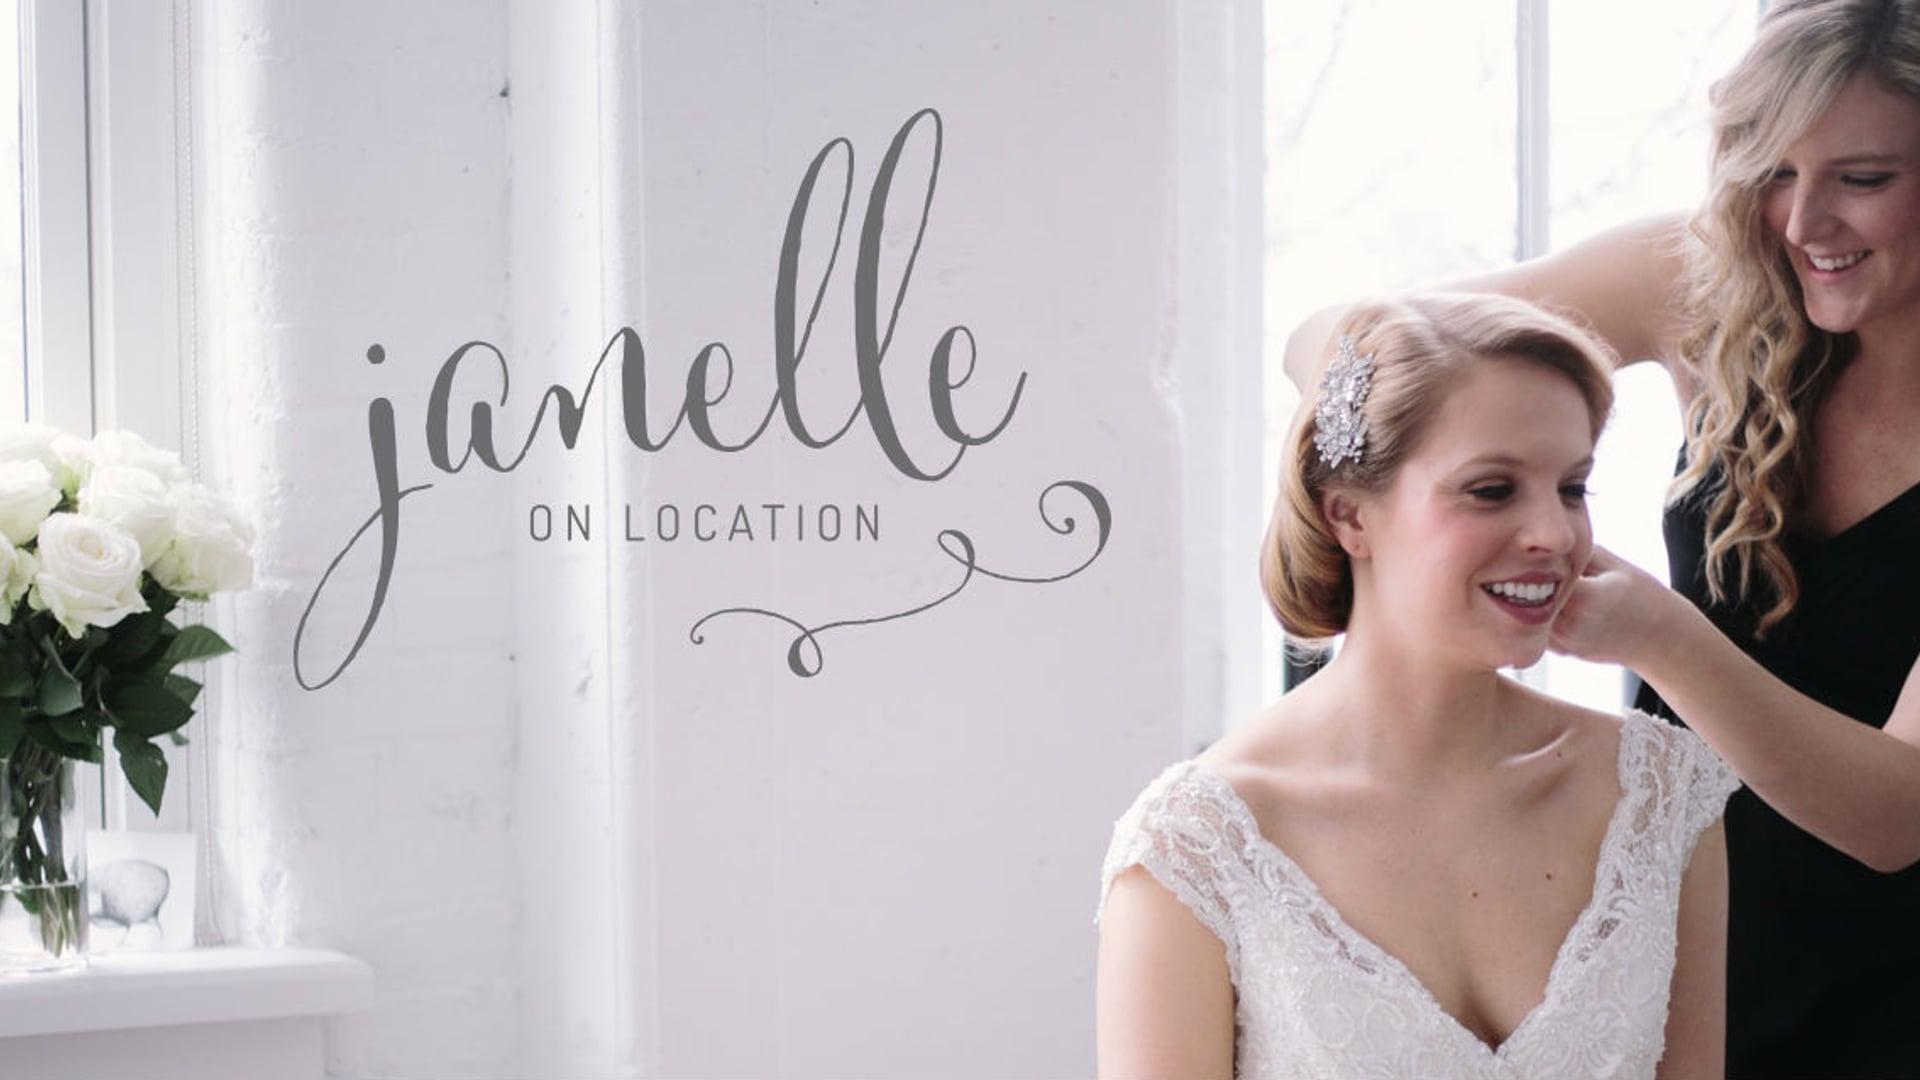 Janelle On Location